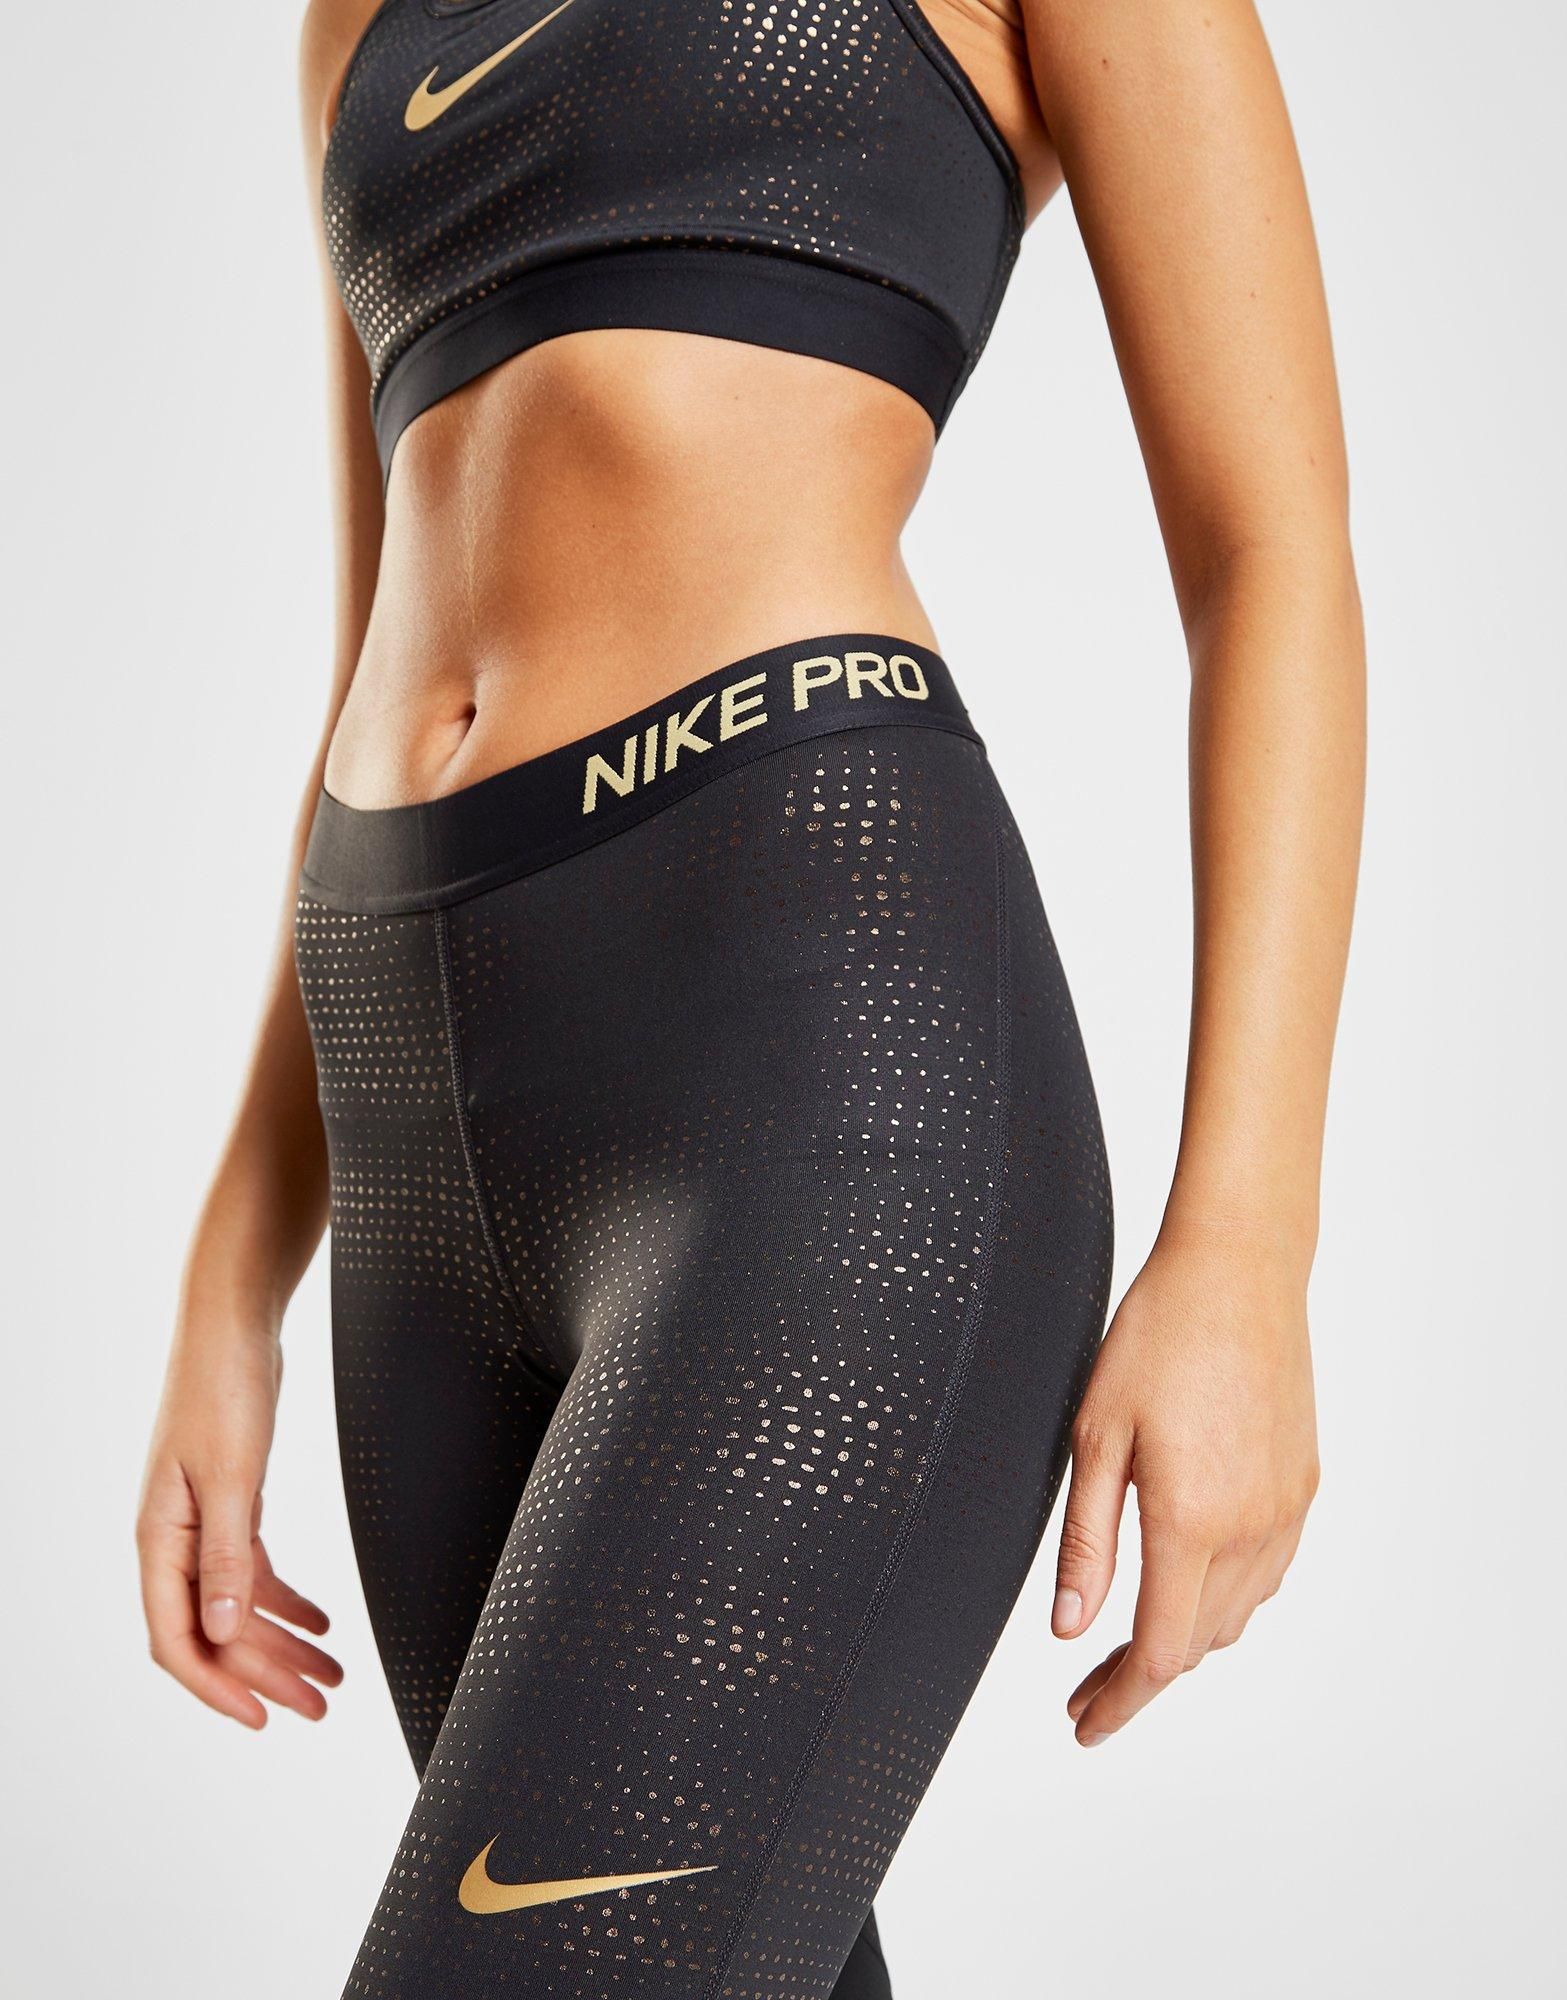 3b2546313ca82 Lyst - Nike Pro Training Metallic Dot Tights in Black